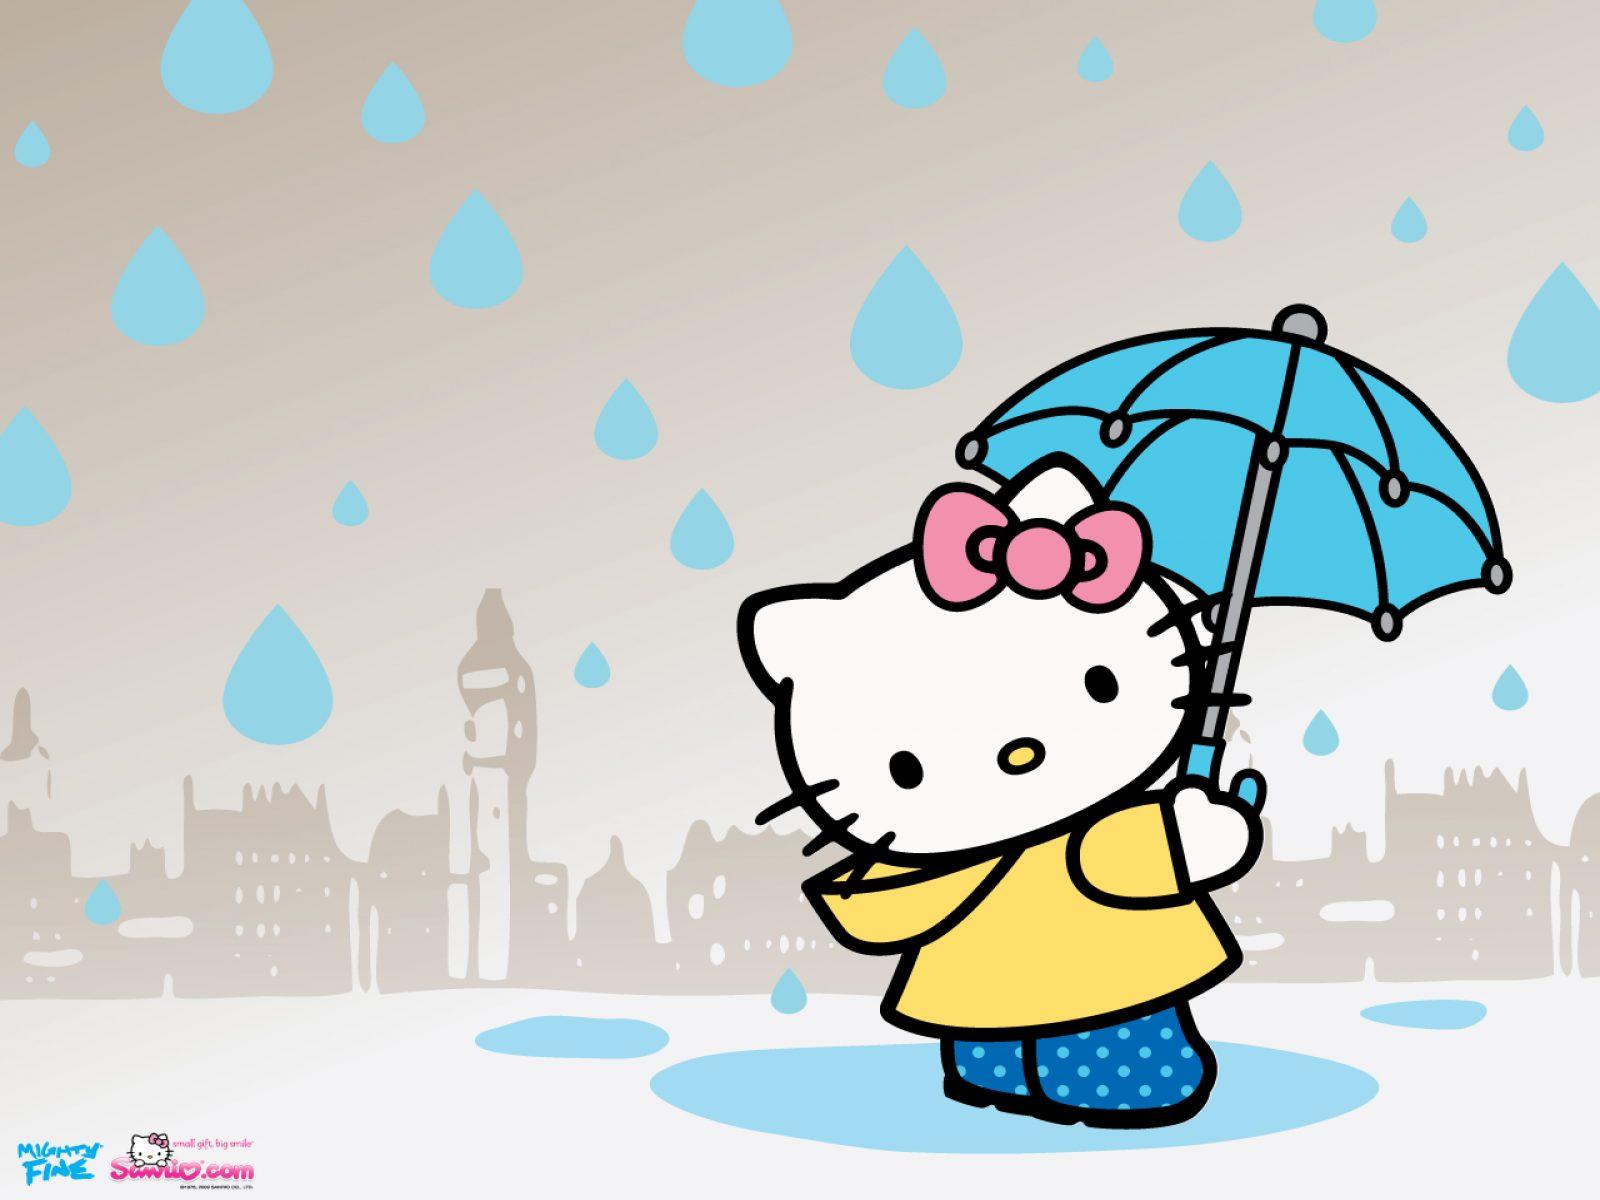 From Hello Kitty Glitter Wallpaper 1600x1200 Full HD Wallpapers 1600x1200